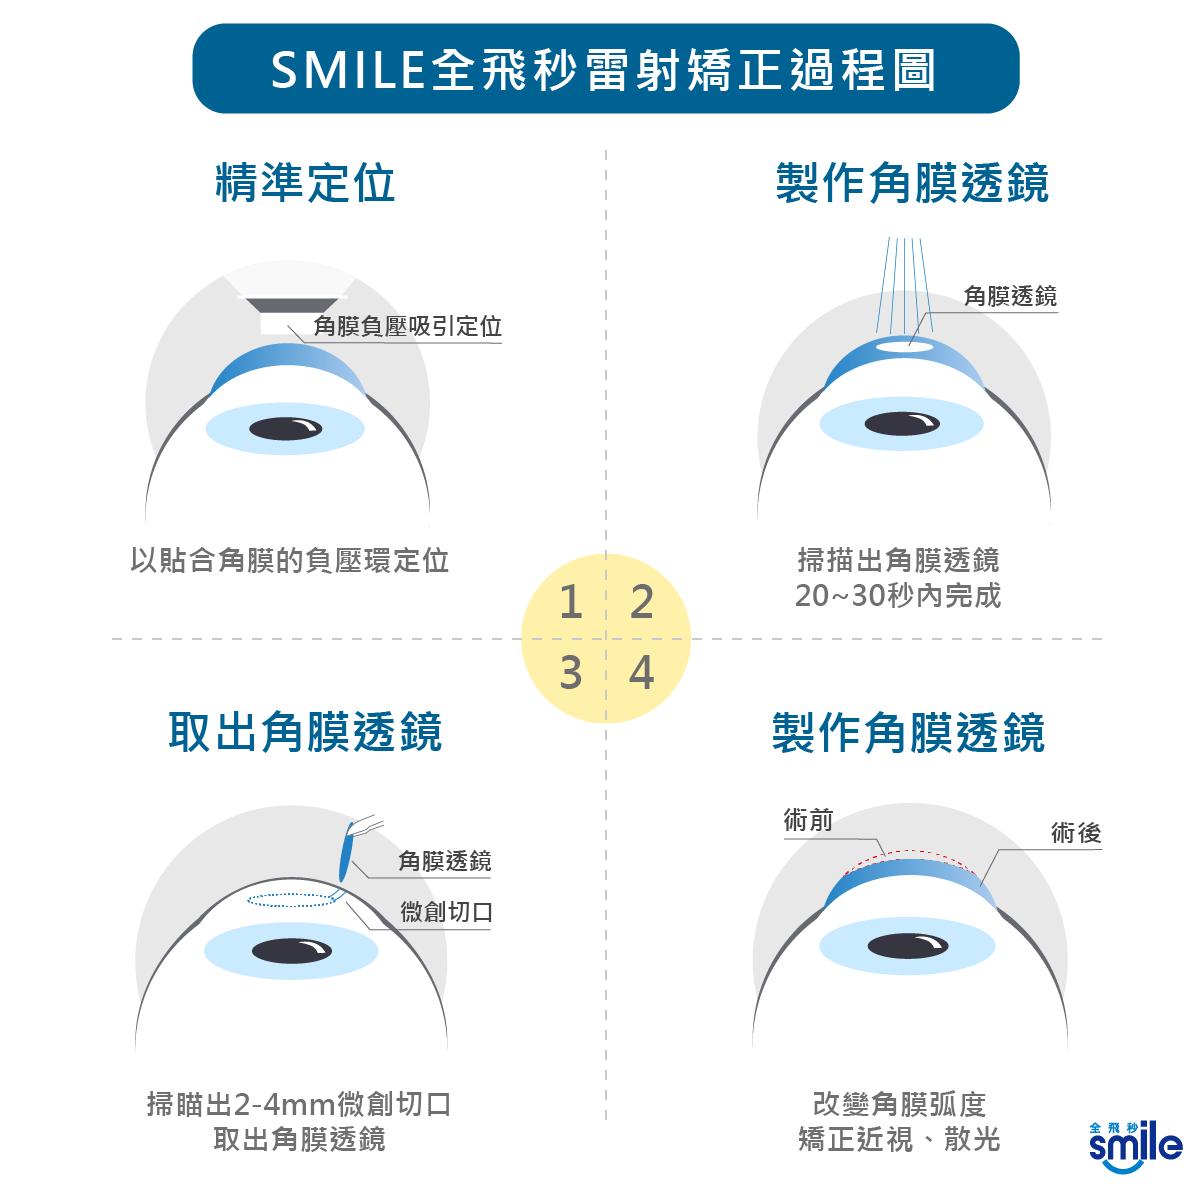 RelexSmile,Myopia,Myopialaser,eyes,smile,laser